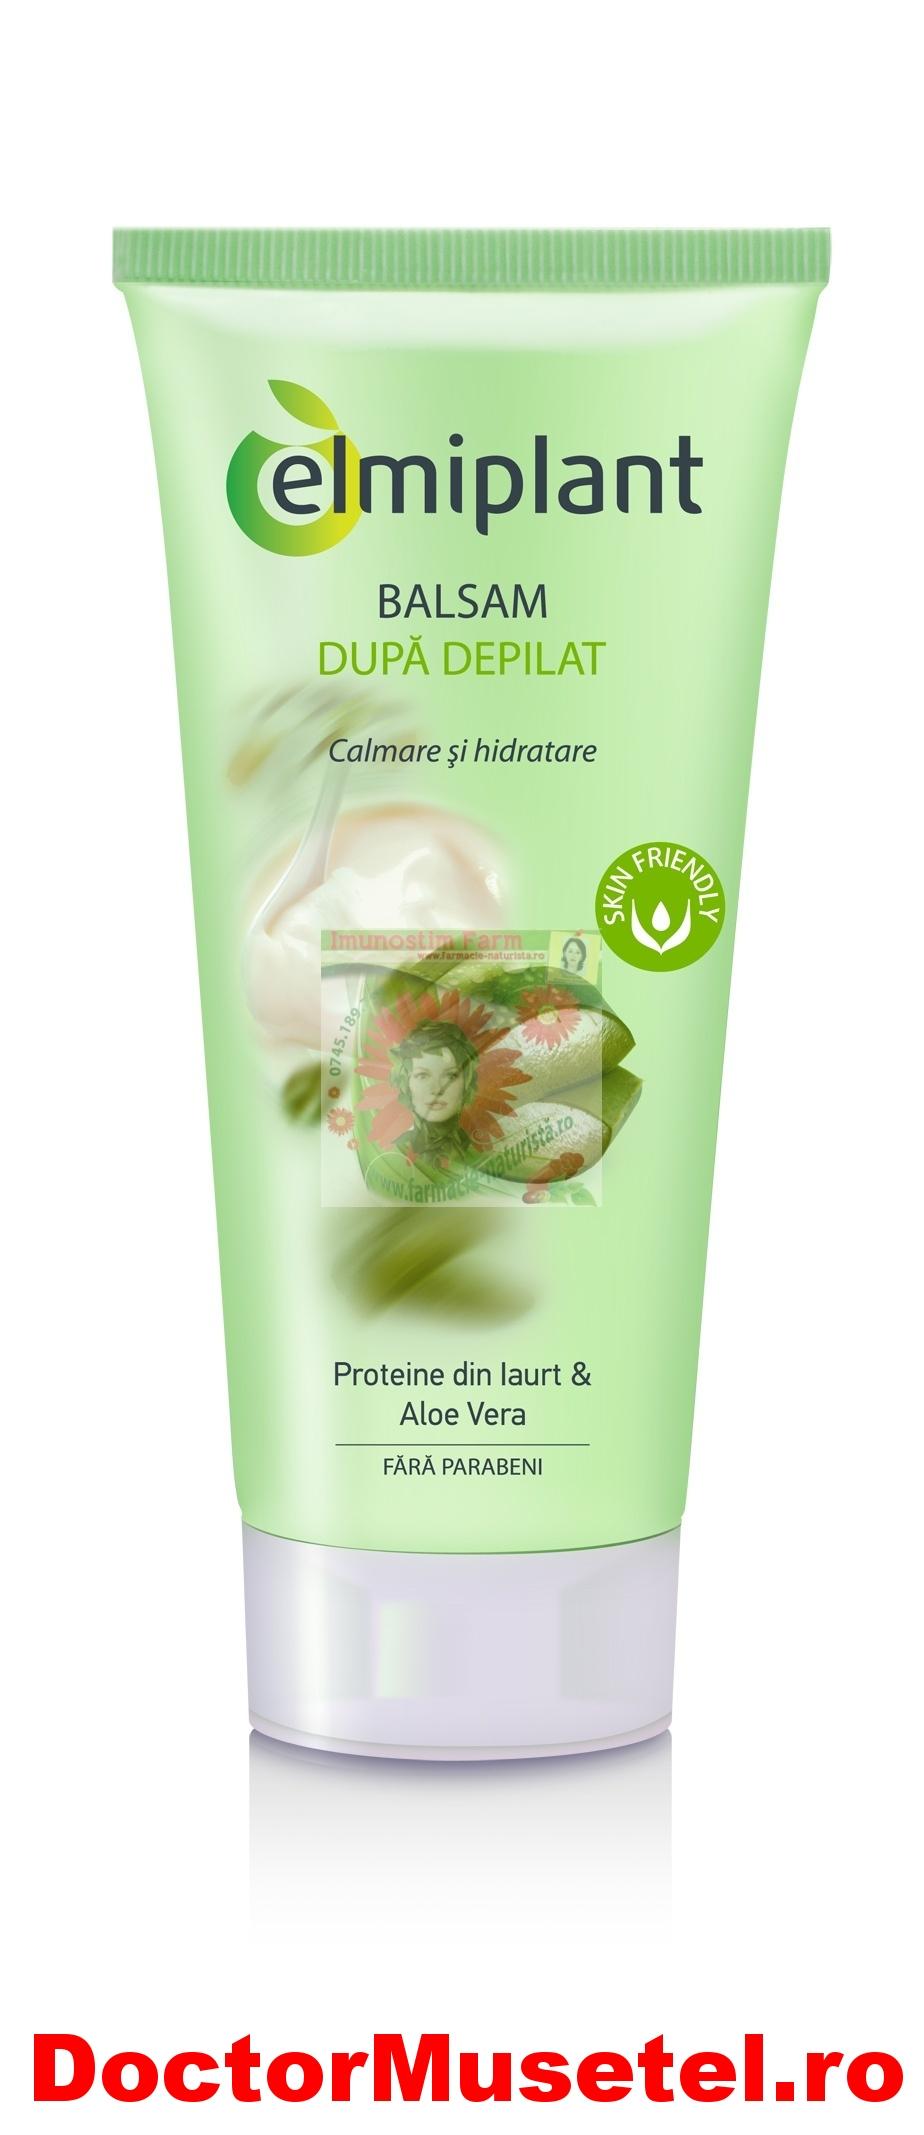 Balsam-dupa-depilat-100ml-ELMIPLANT-www-farmacie-naturista-ro.jpg